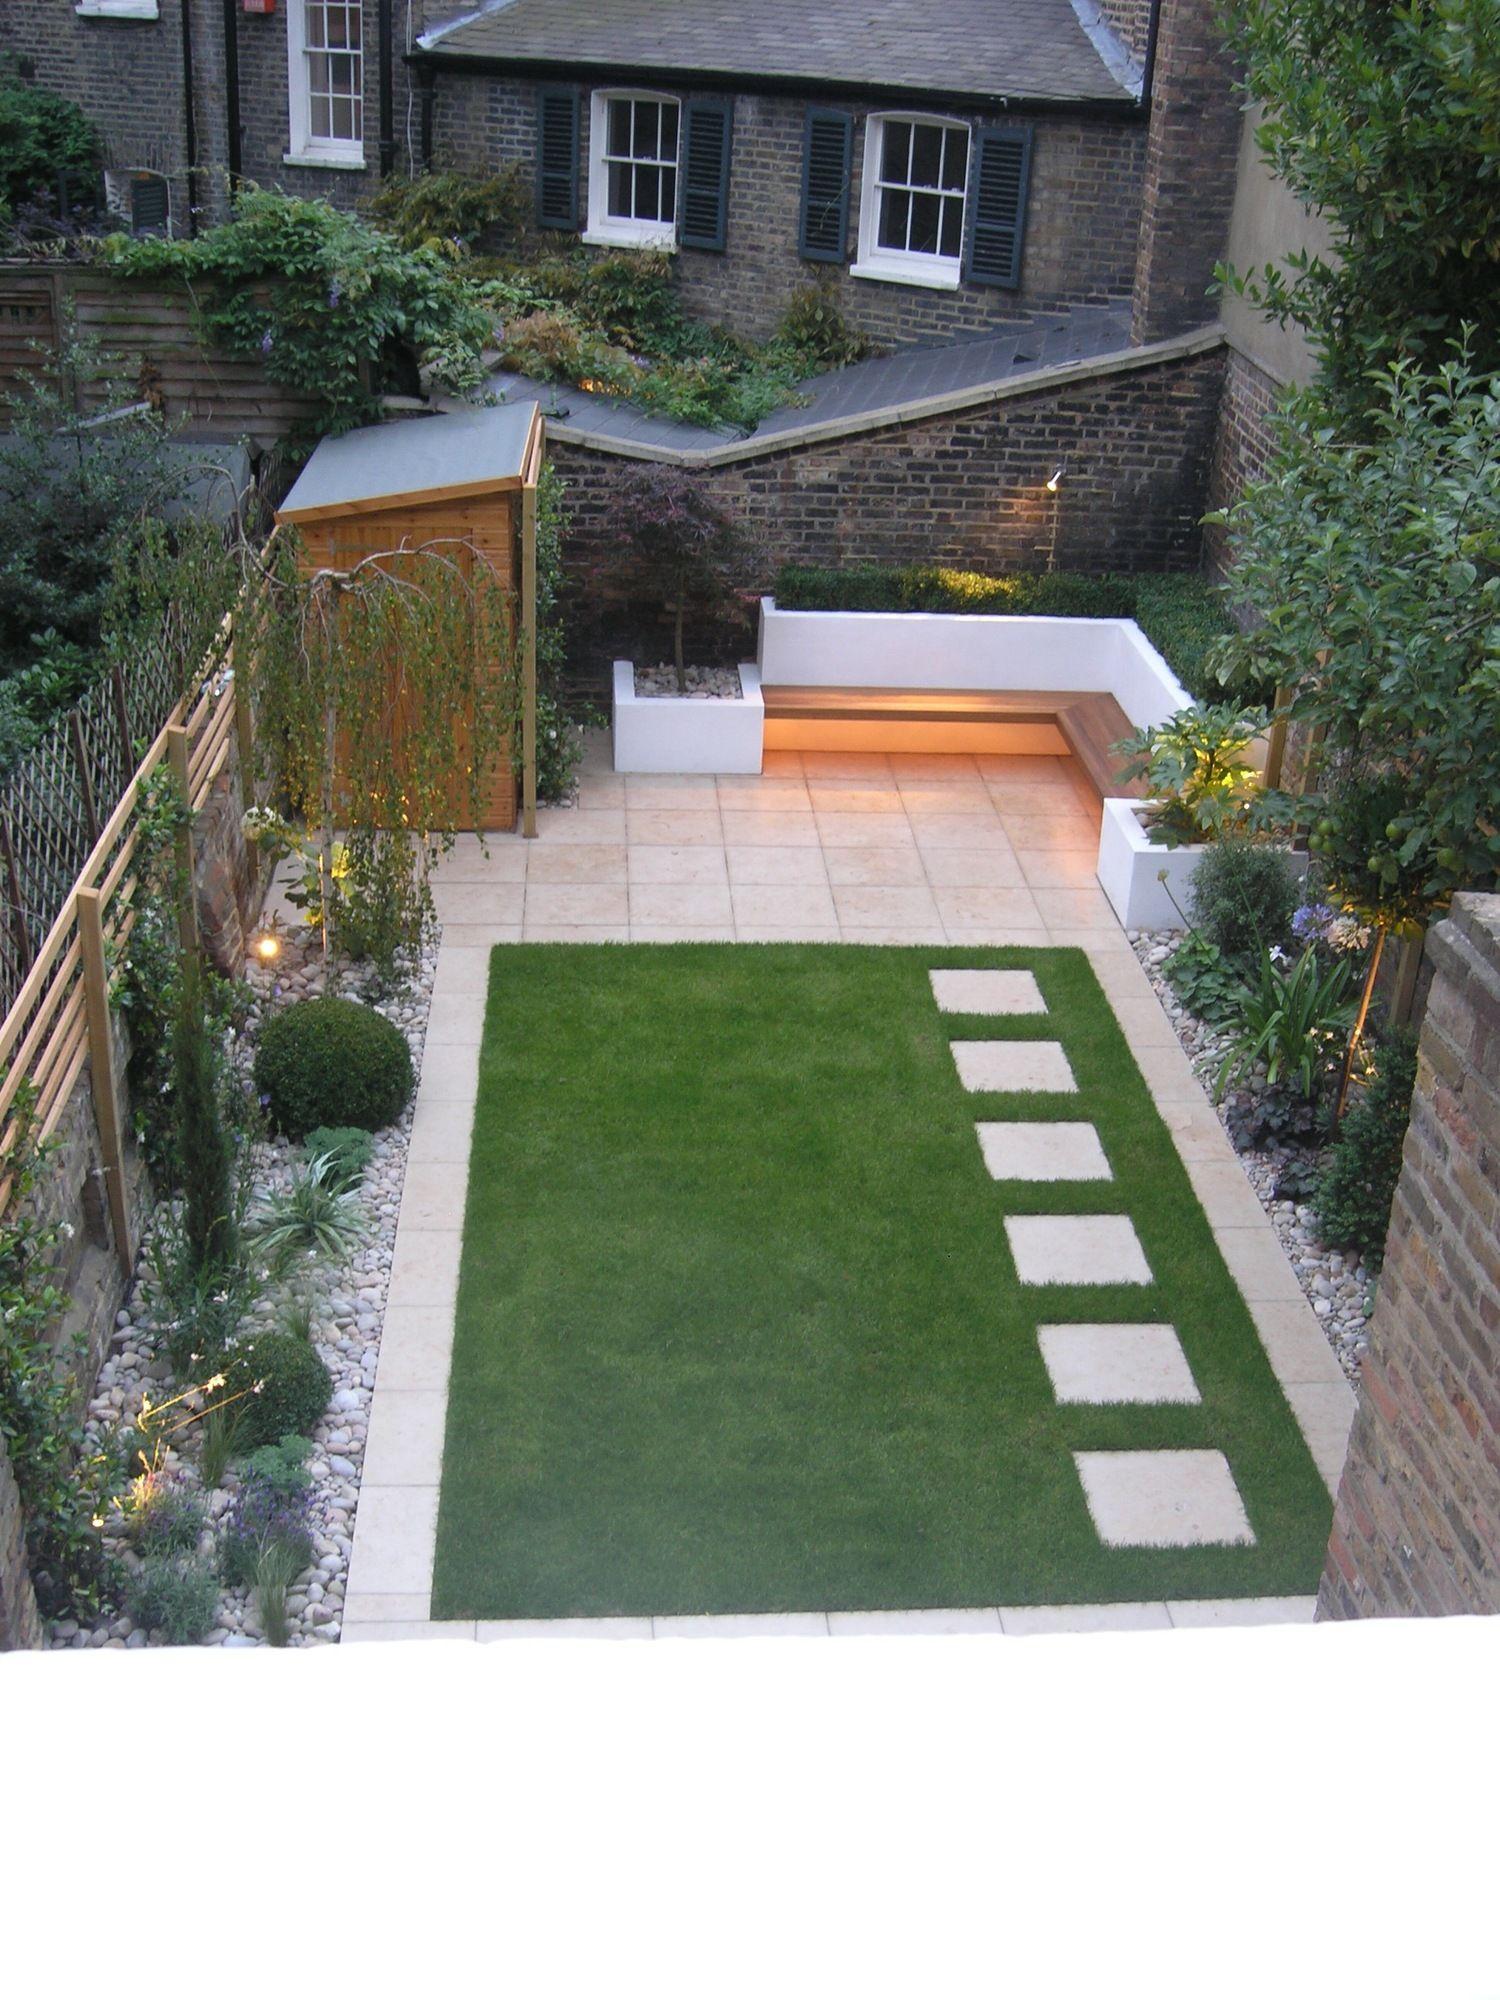 jardim back garden design small backyard landscaping on layouts and landscaping small backyards ideas id=56264